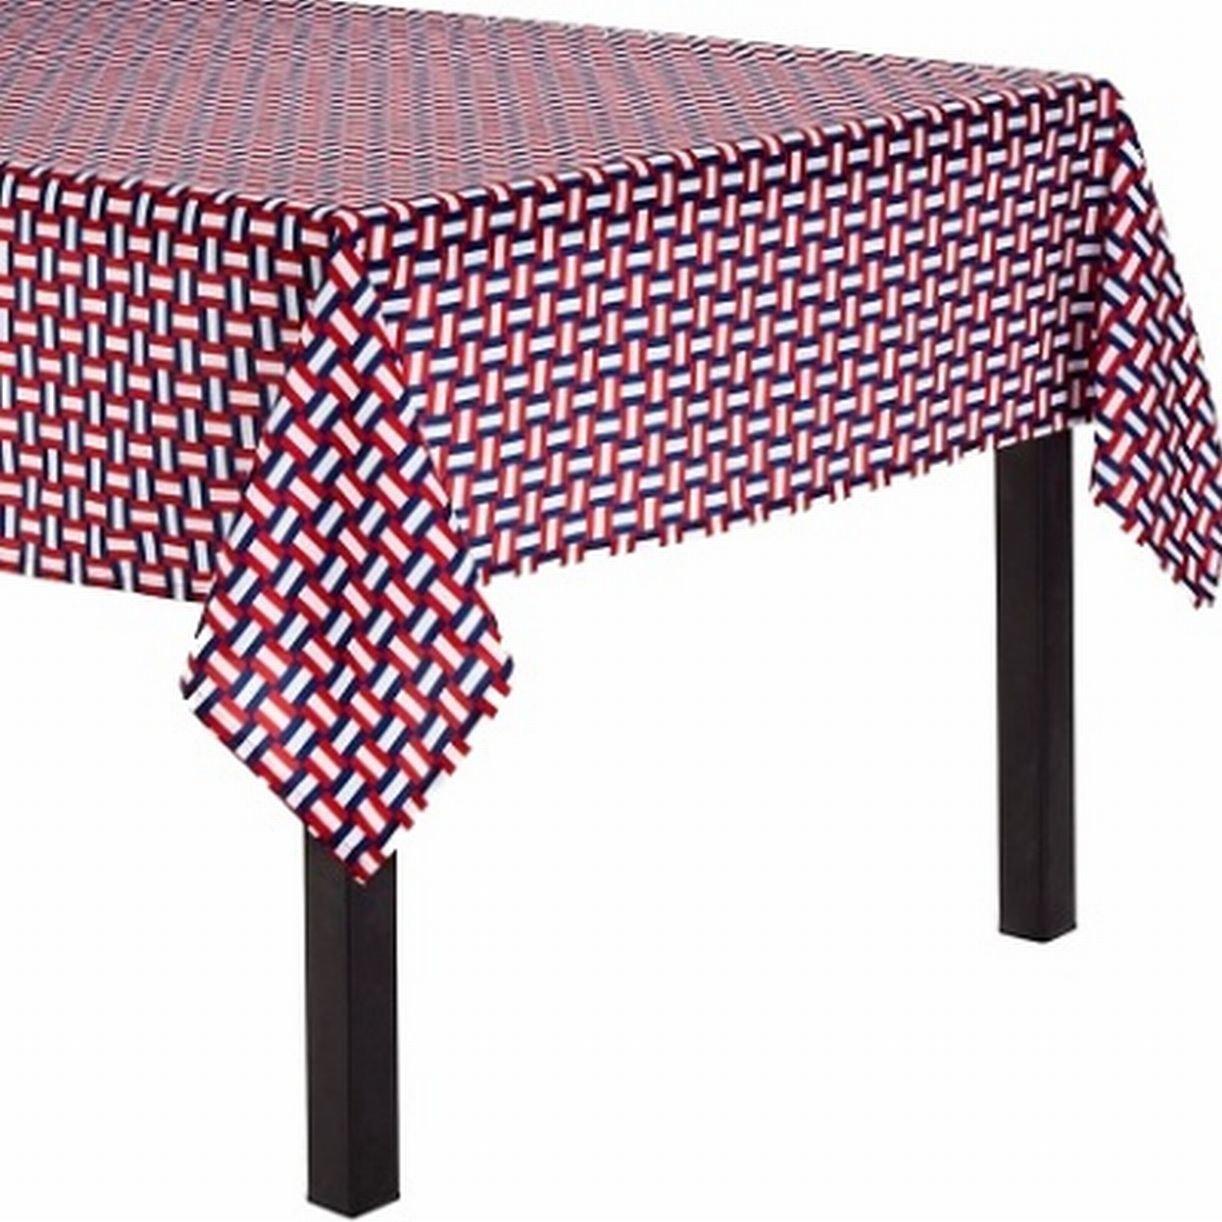 Amazoncom americana home decor - Amazon Com Summer Decor Americana Tablecloth Red White Blue Fabric Table Cloth 70 Round Home Kitchen